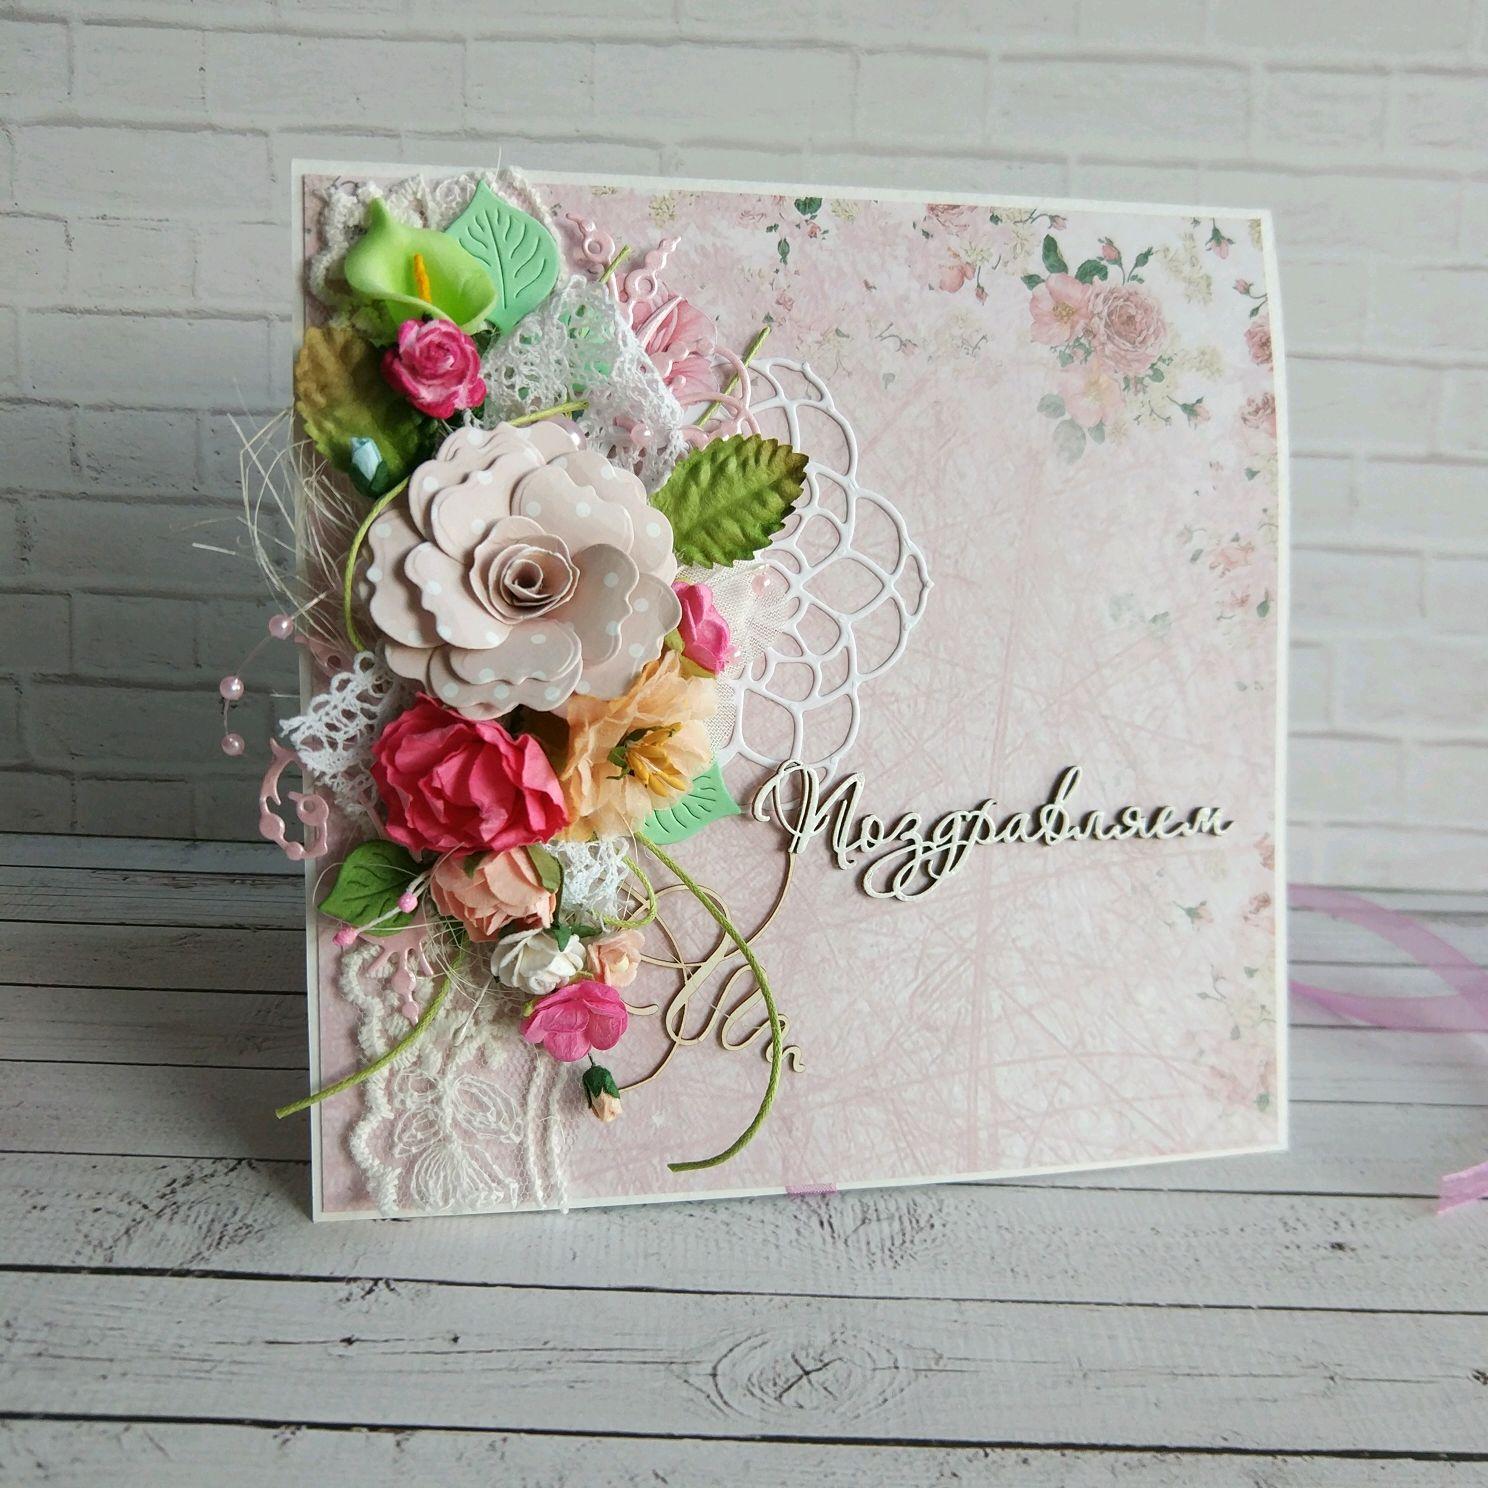 Слово, открытки под заказ москва